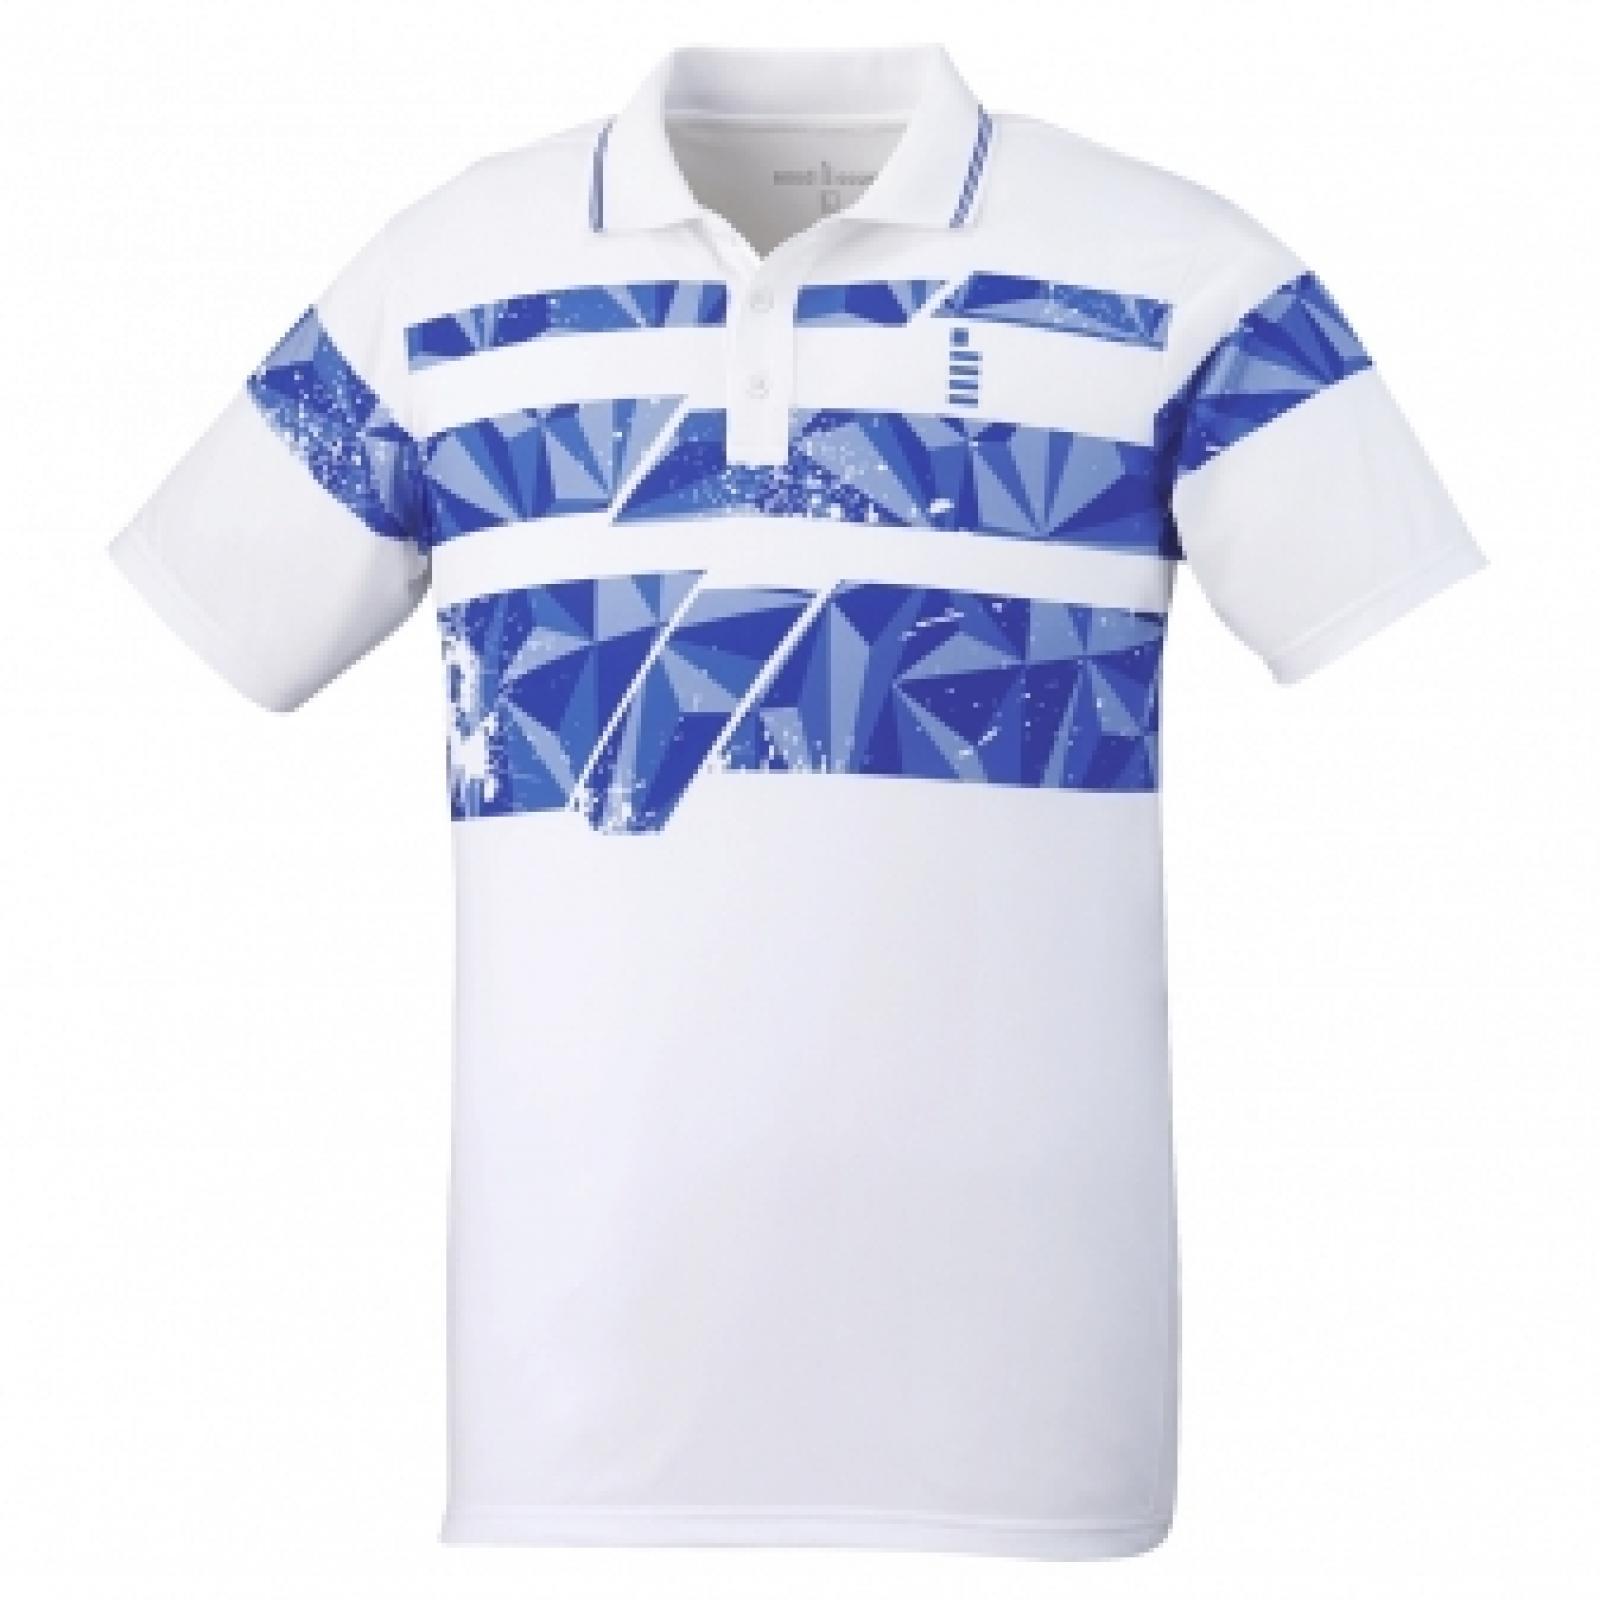 https://www.badec.store/produkty_img/badmintonove-tricko1570119737L.jpg